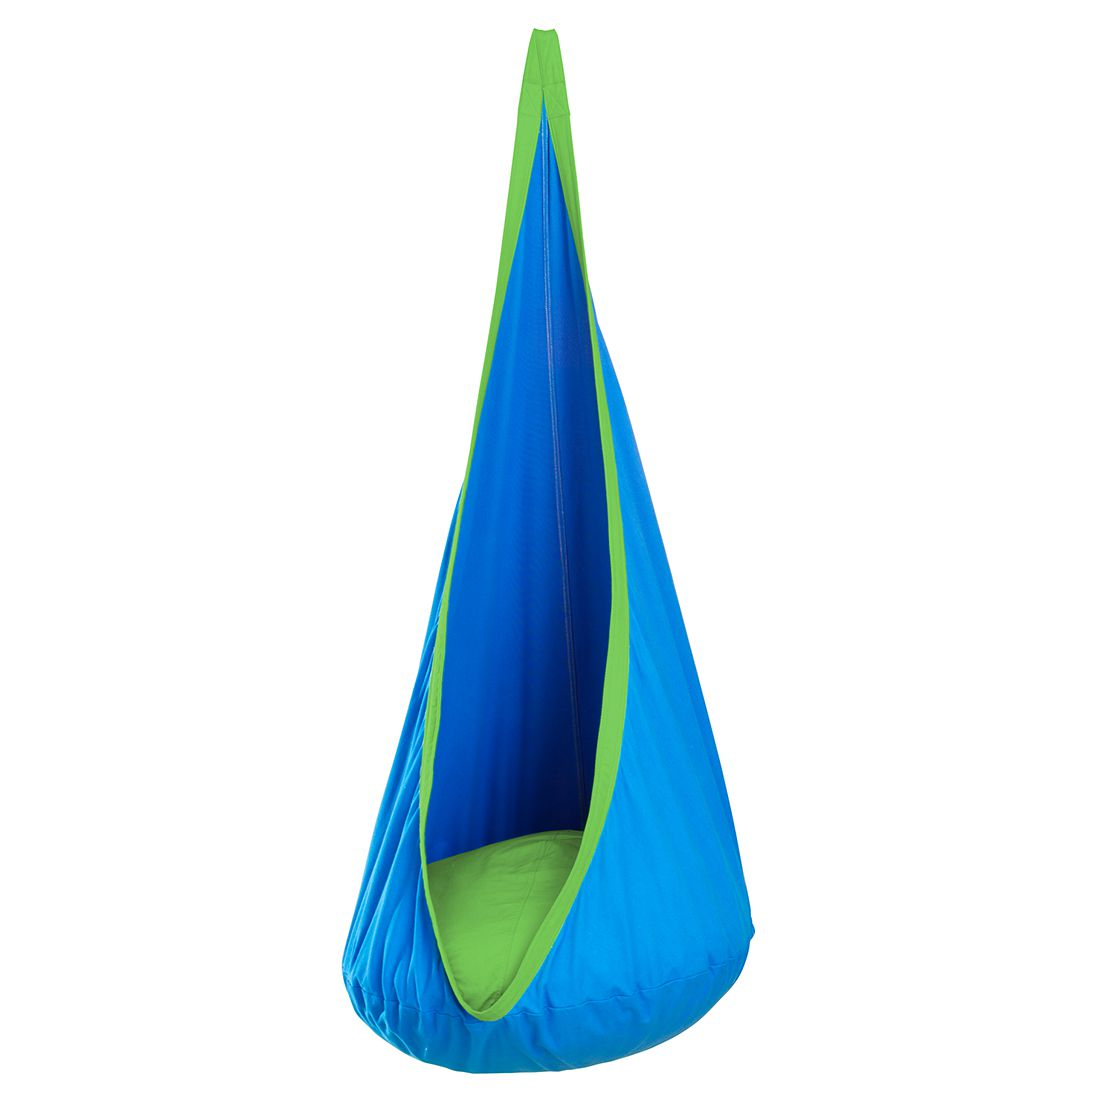 Hängehöhle Joki – Blau/Grün, La Siesta günstig